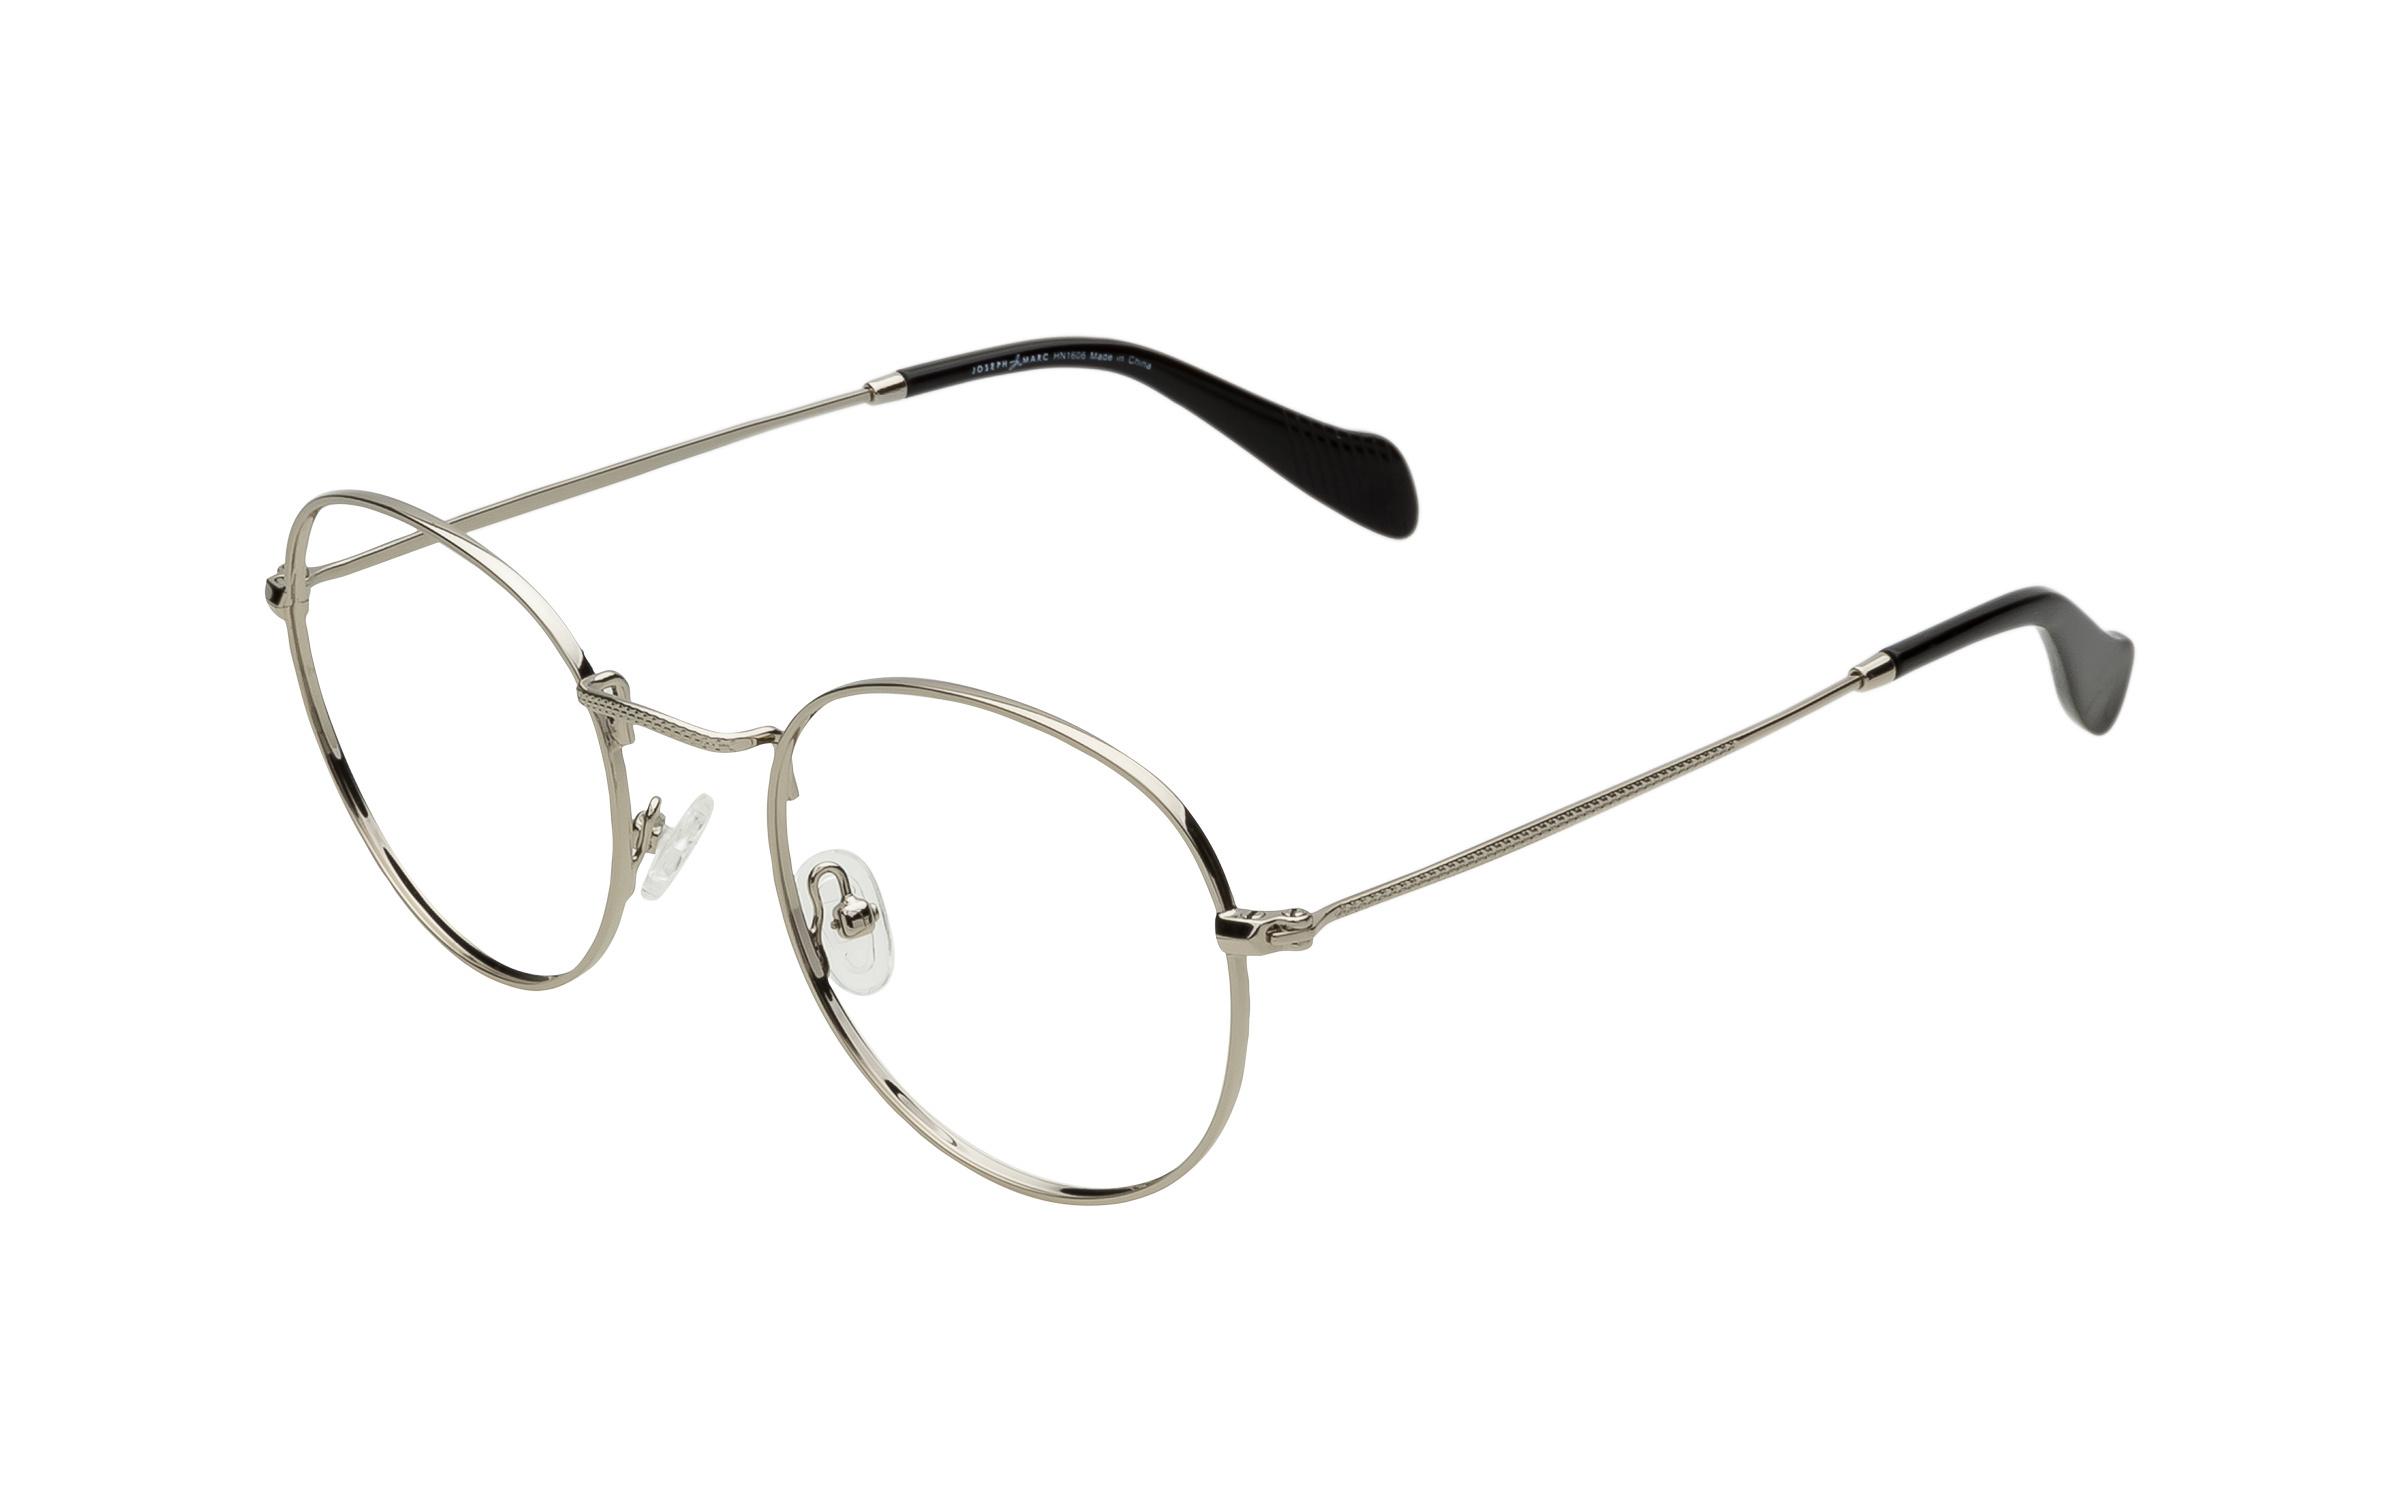 shop with confidence for joseph marc procedure 50 glasses